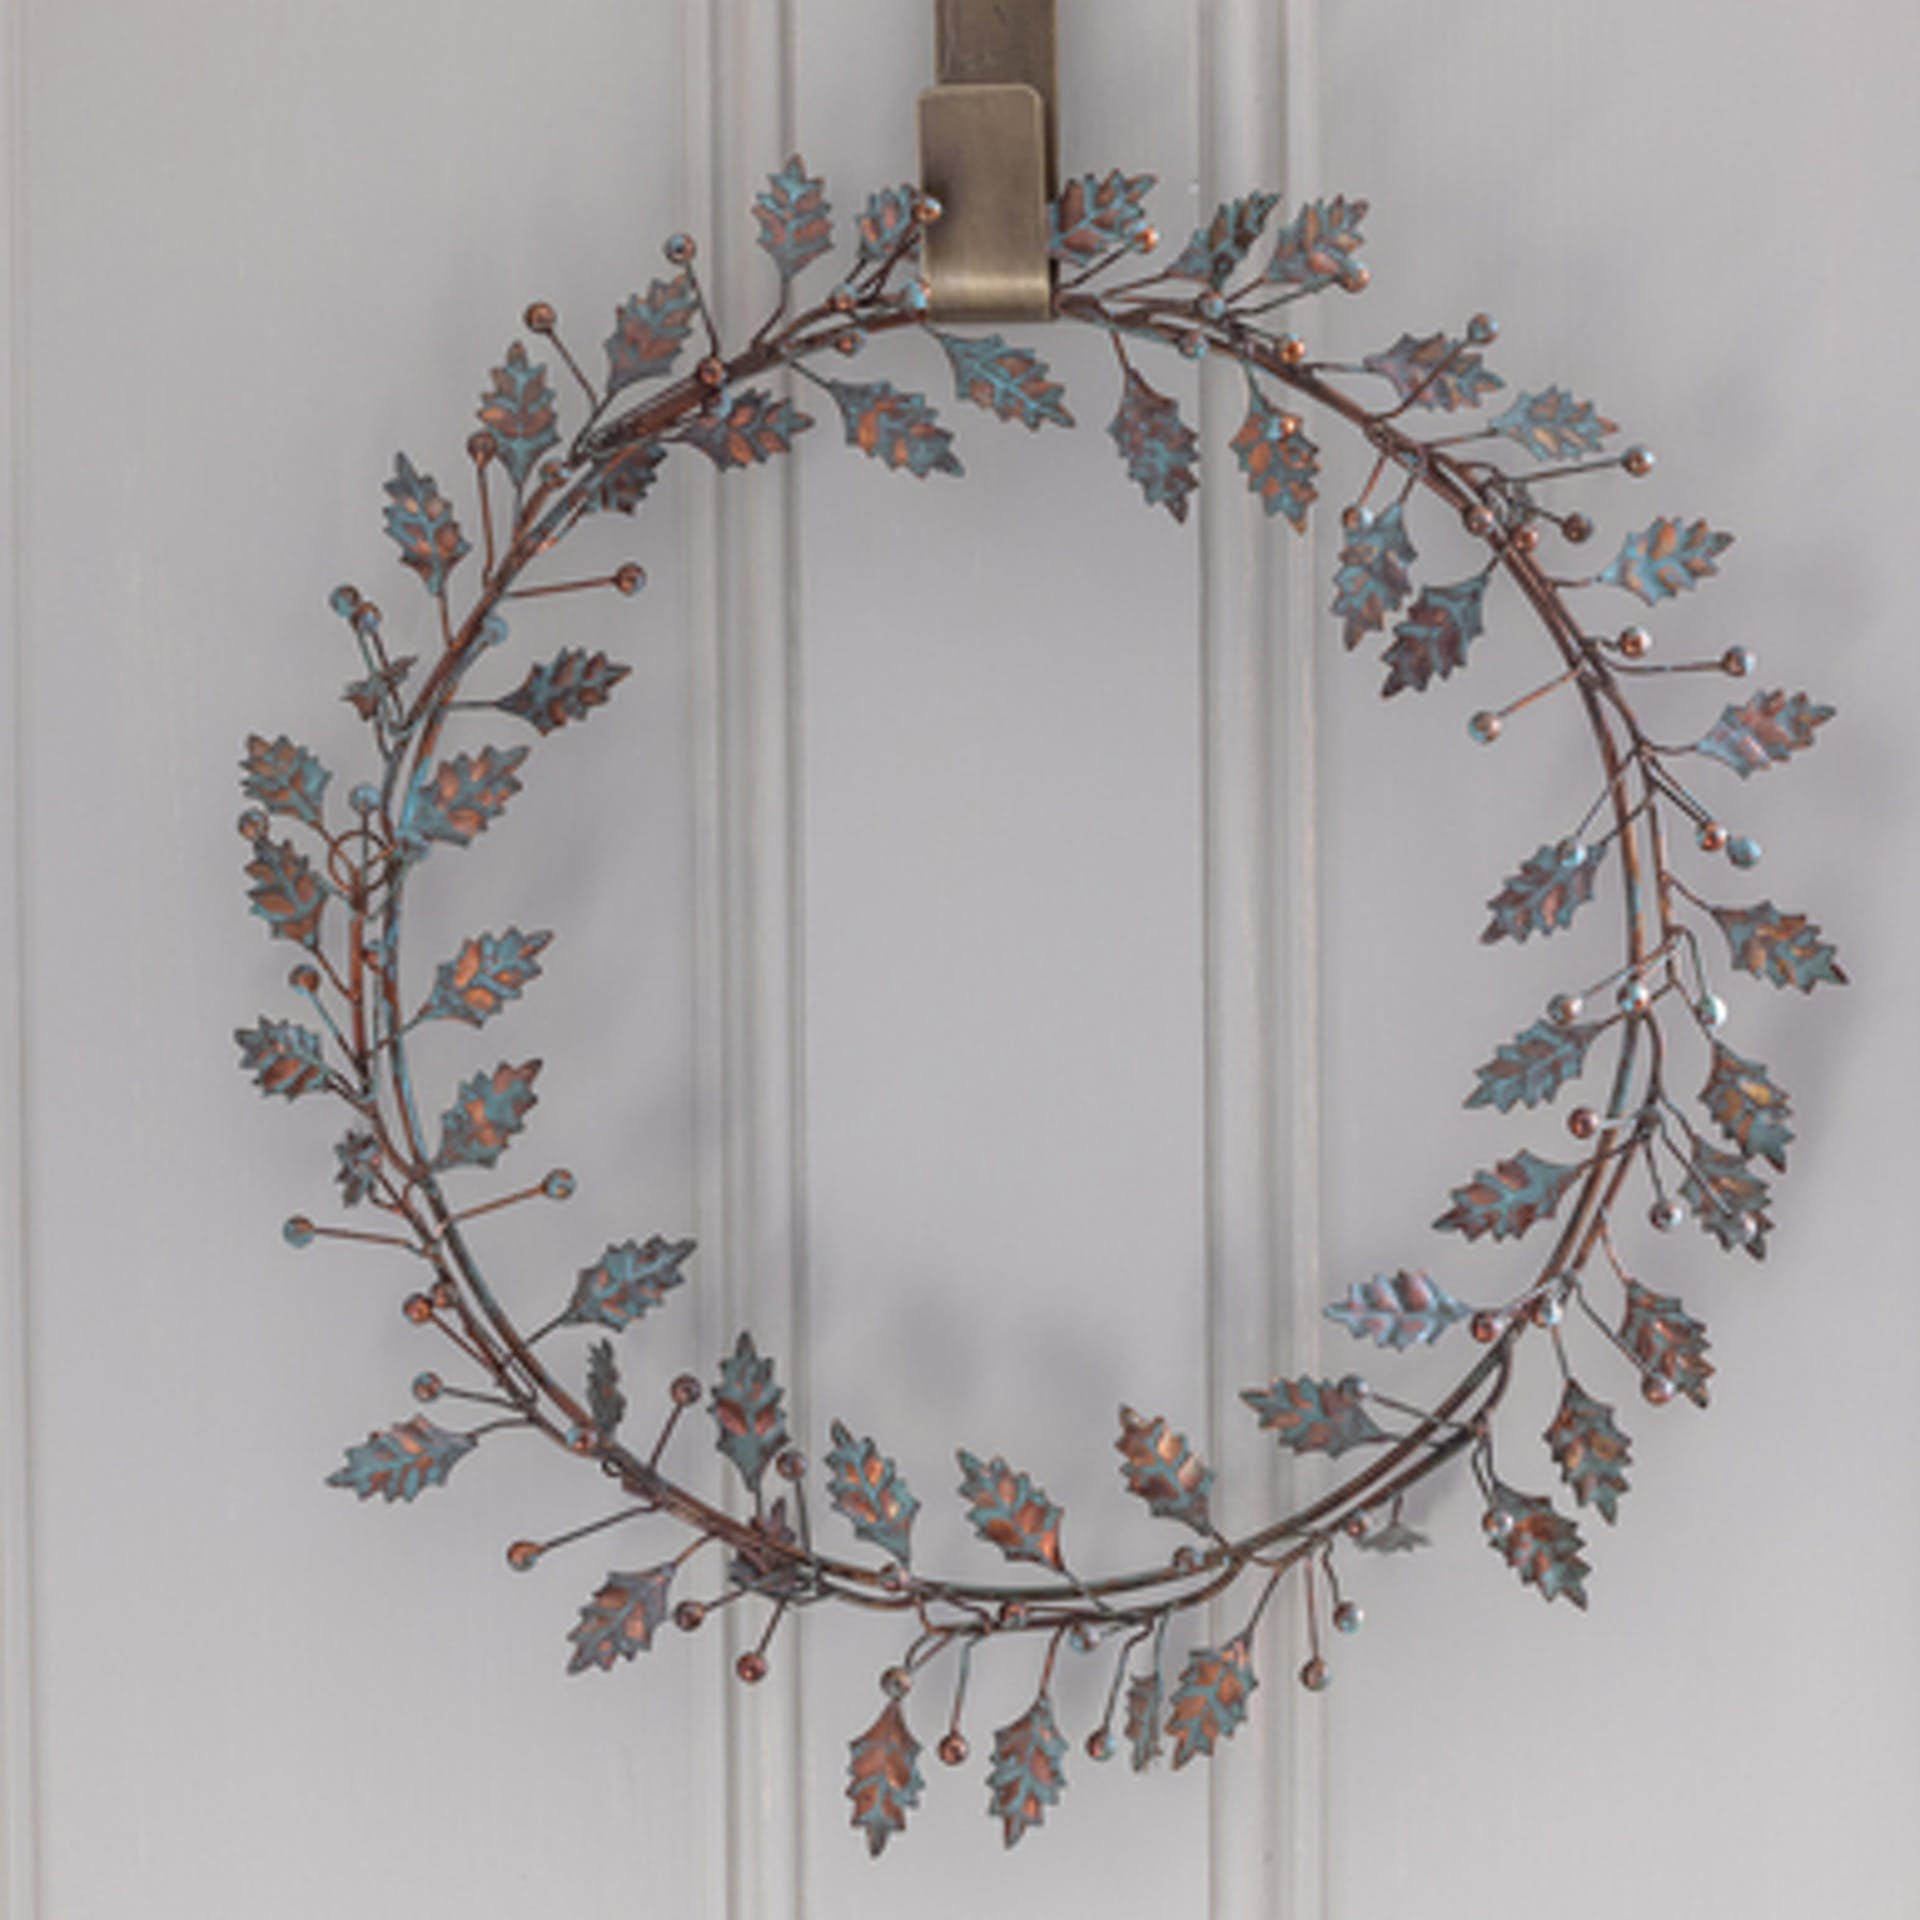 Vintage Holly Wreath